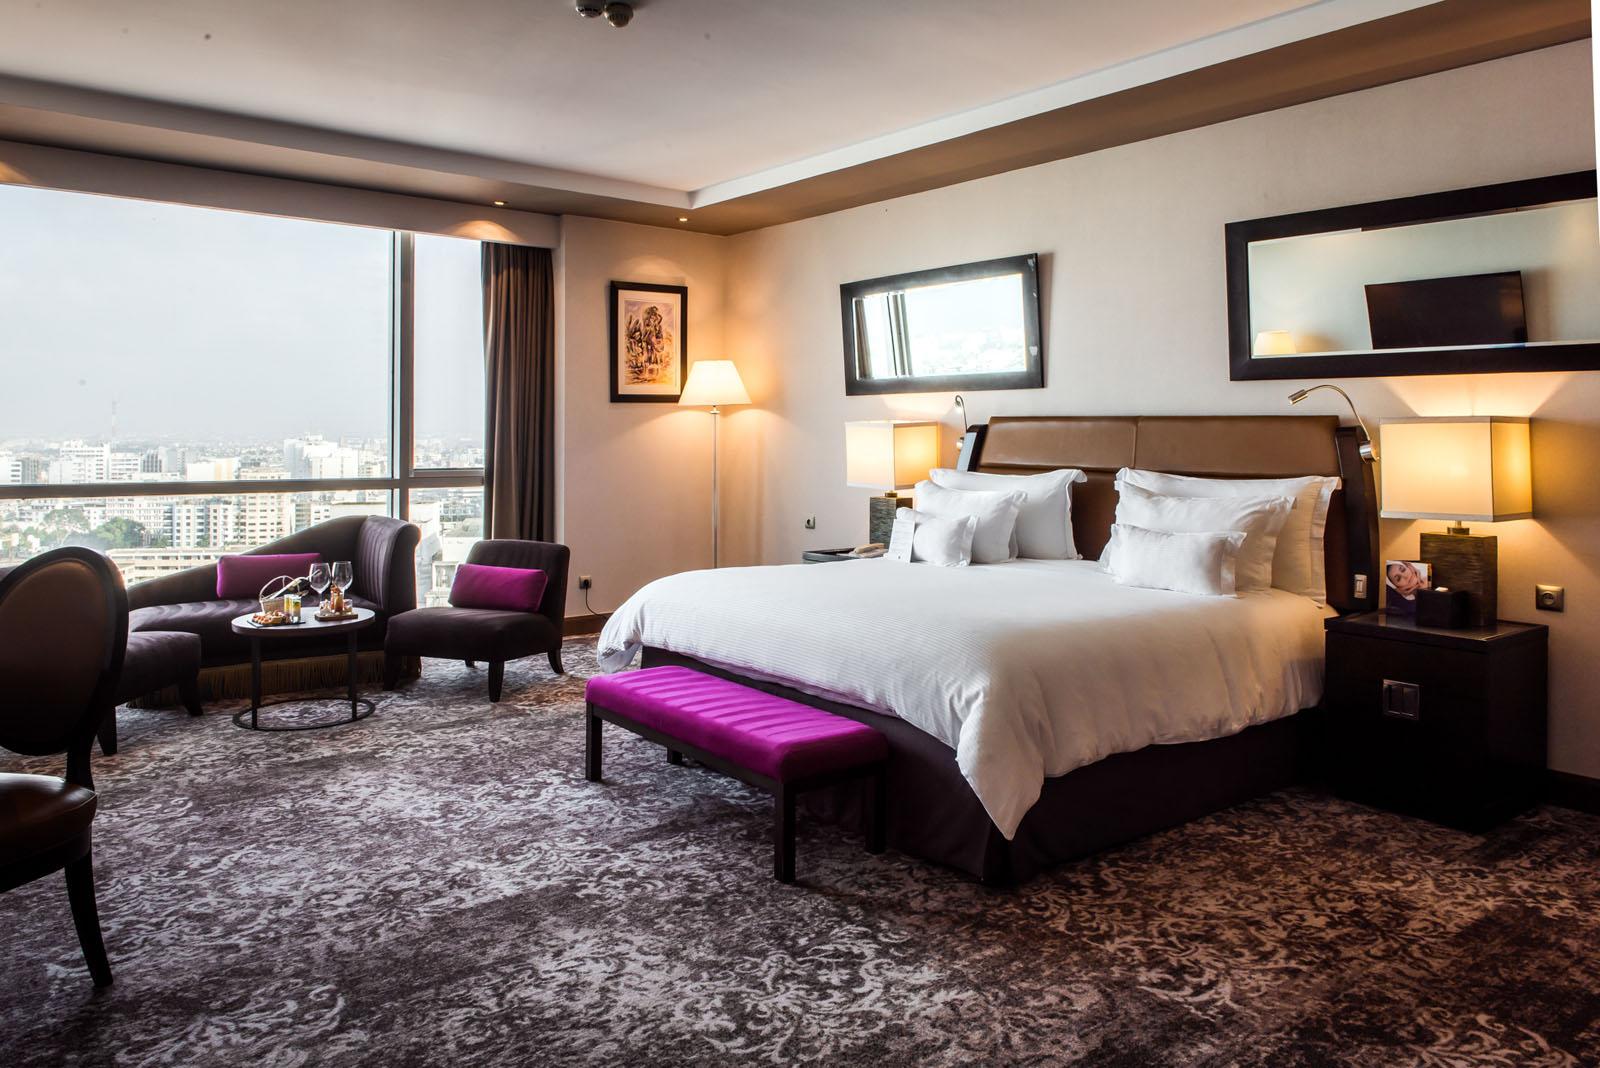 Premium Sky Suite at Kenzi Tower Hotel in central Casablanca, Mo